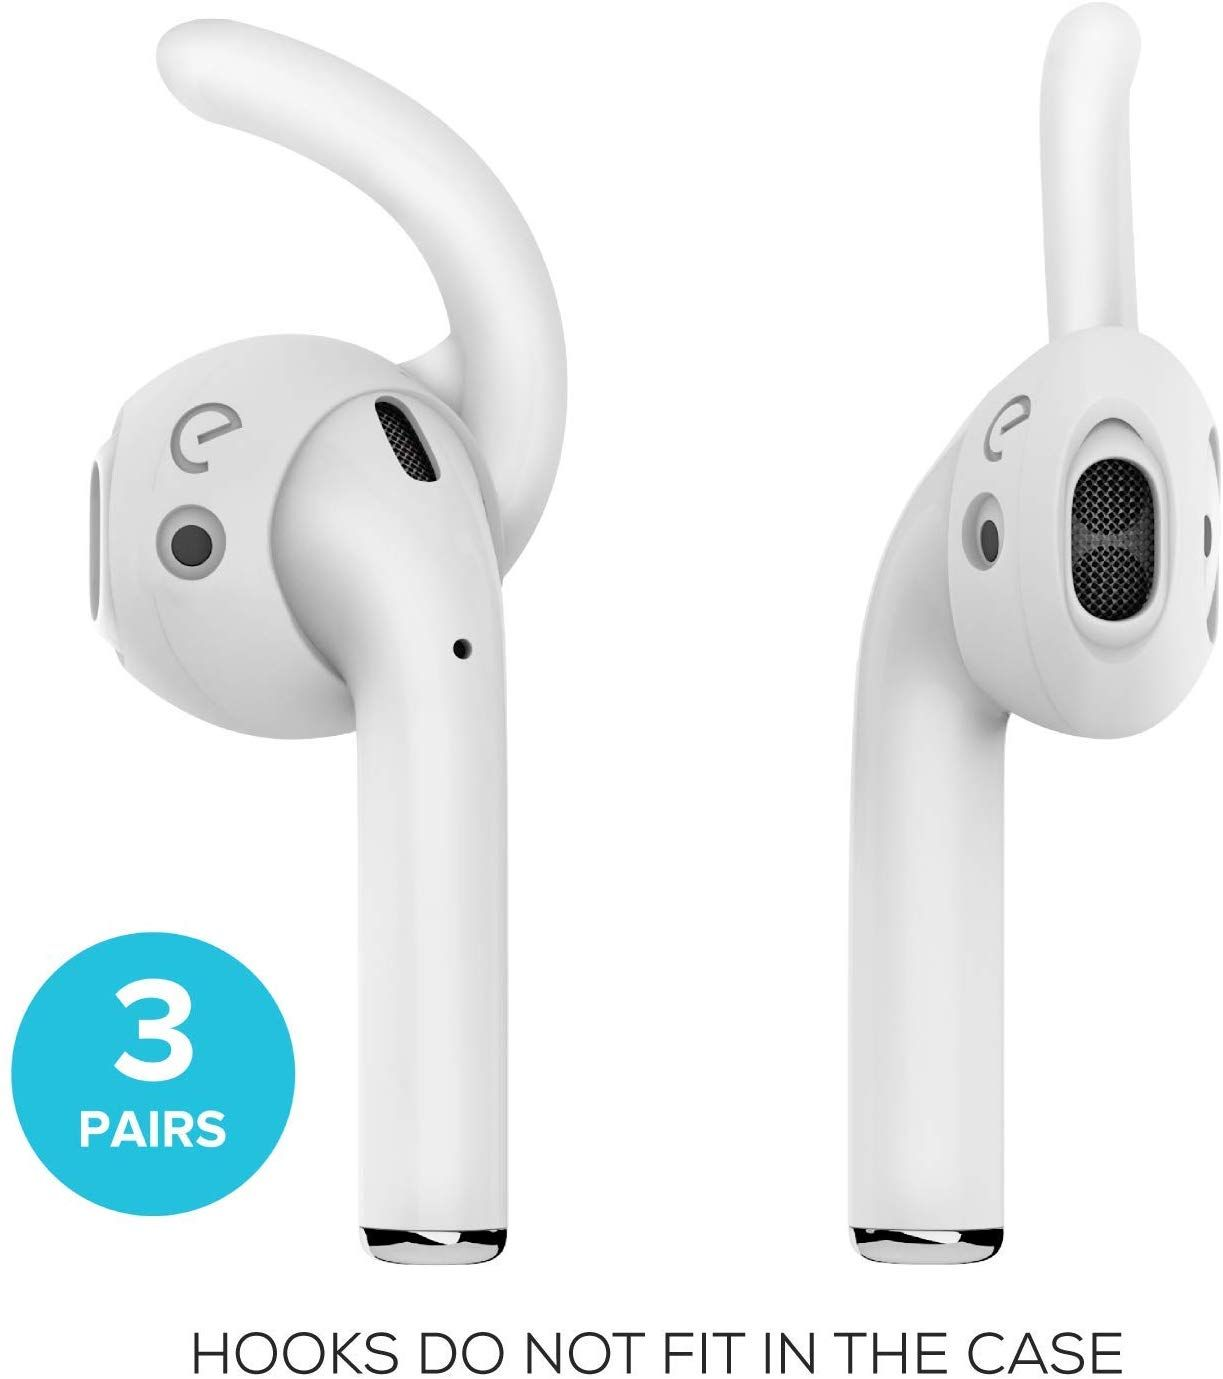 Earbuddyz 2 0 Ear Hooks And Covers Headphones Earphone Earbuds